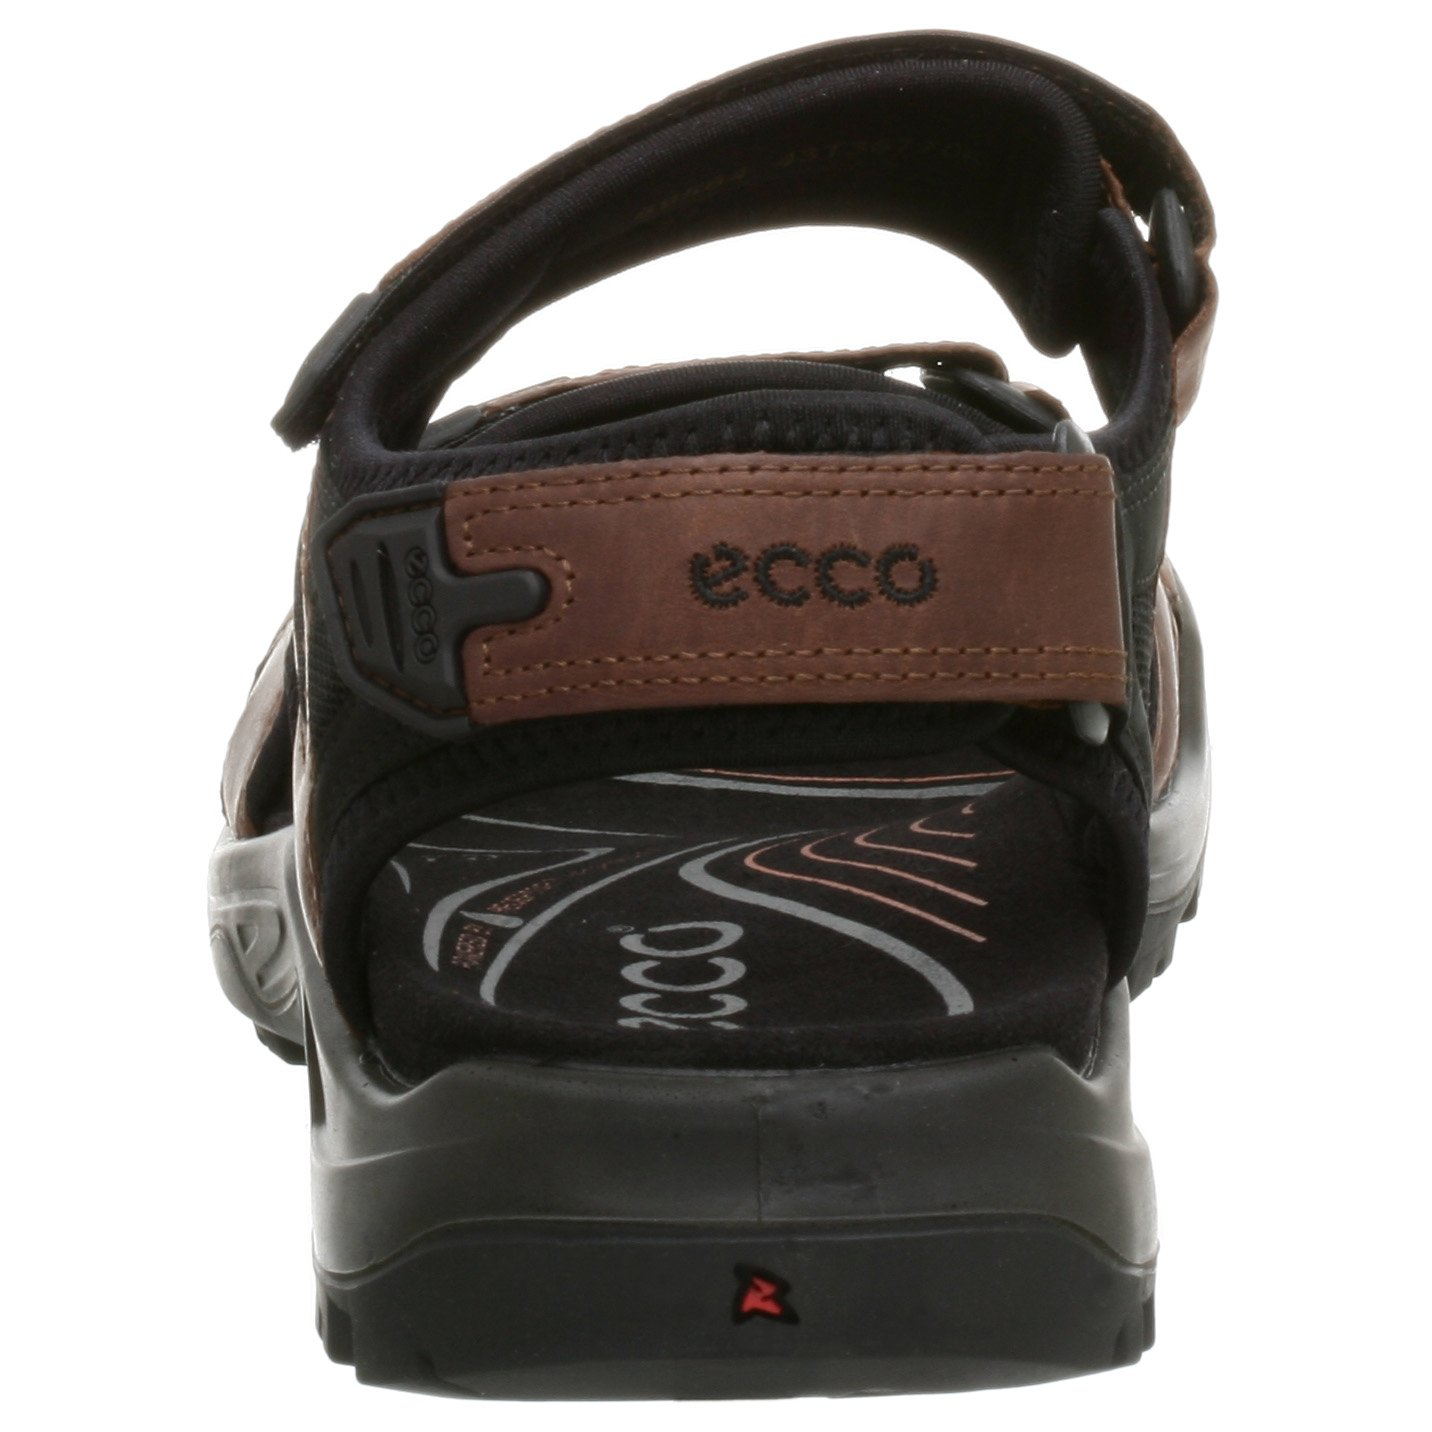 ECCO Men's Yucatan Sandal,Bison/Black/Black,44 EU (US Men's 10-10.5 M) by ECCO (Image #2)